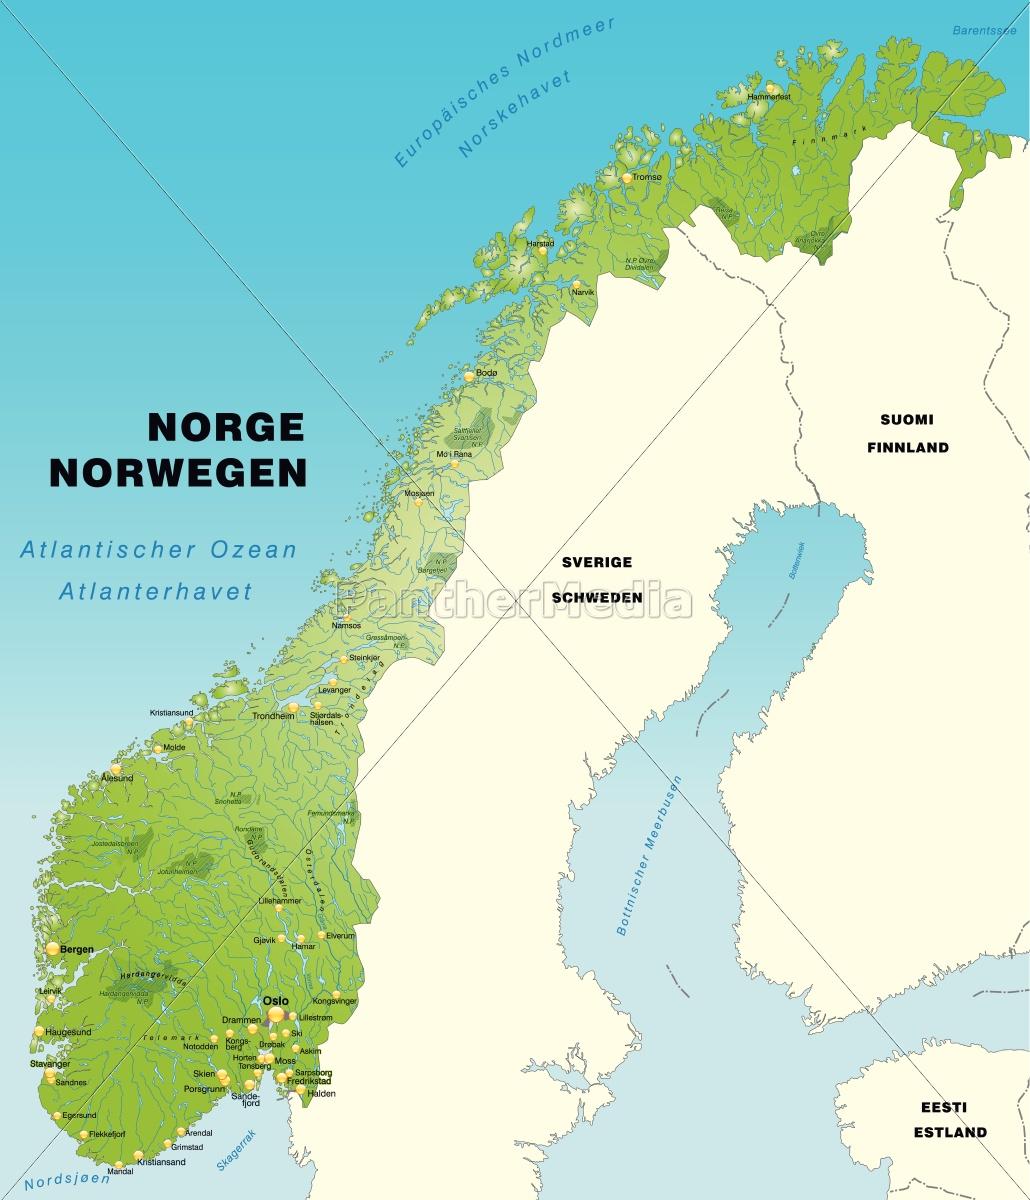 Kort Over Norge Kort Over Bergen 2019 10 12